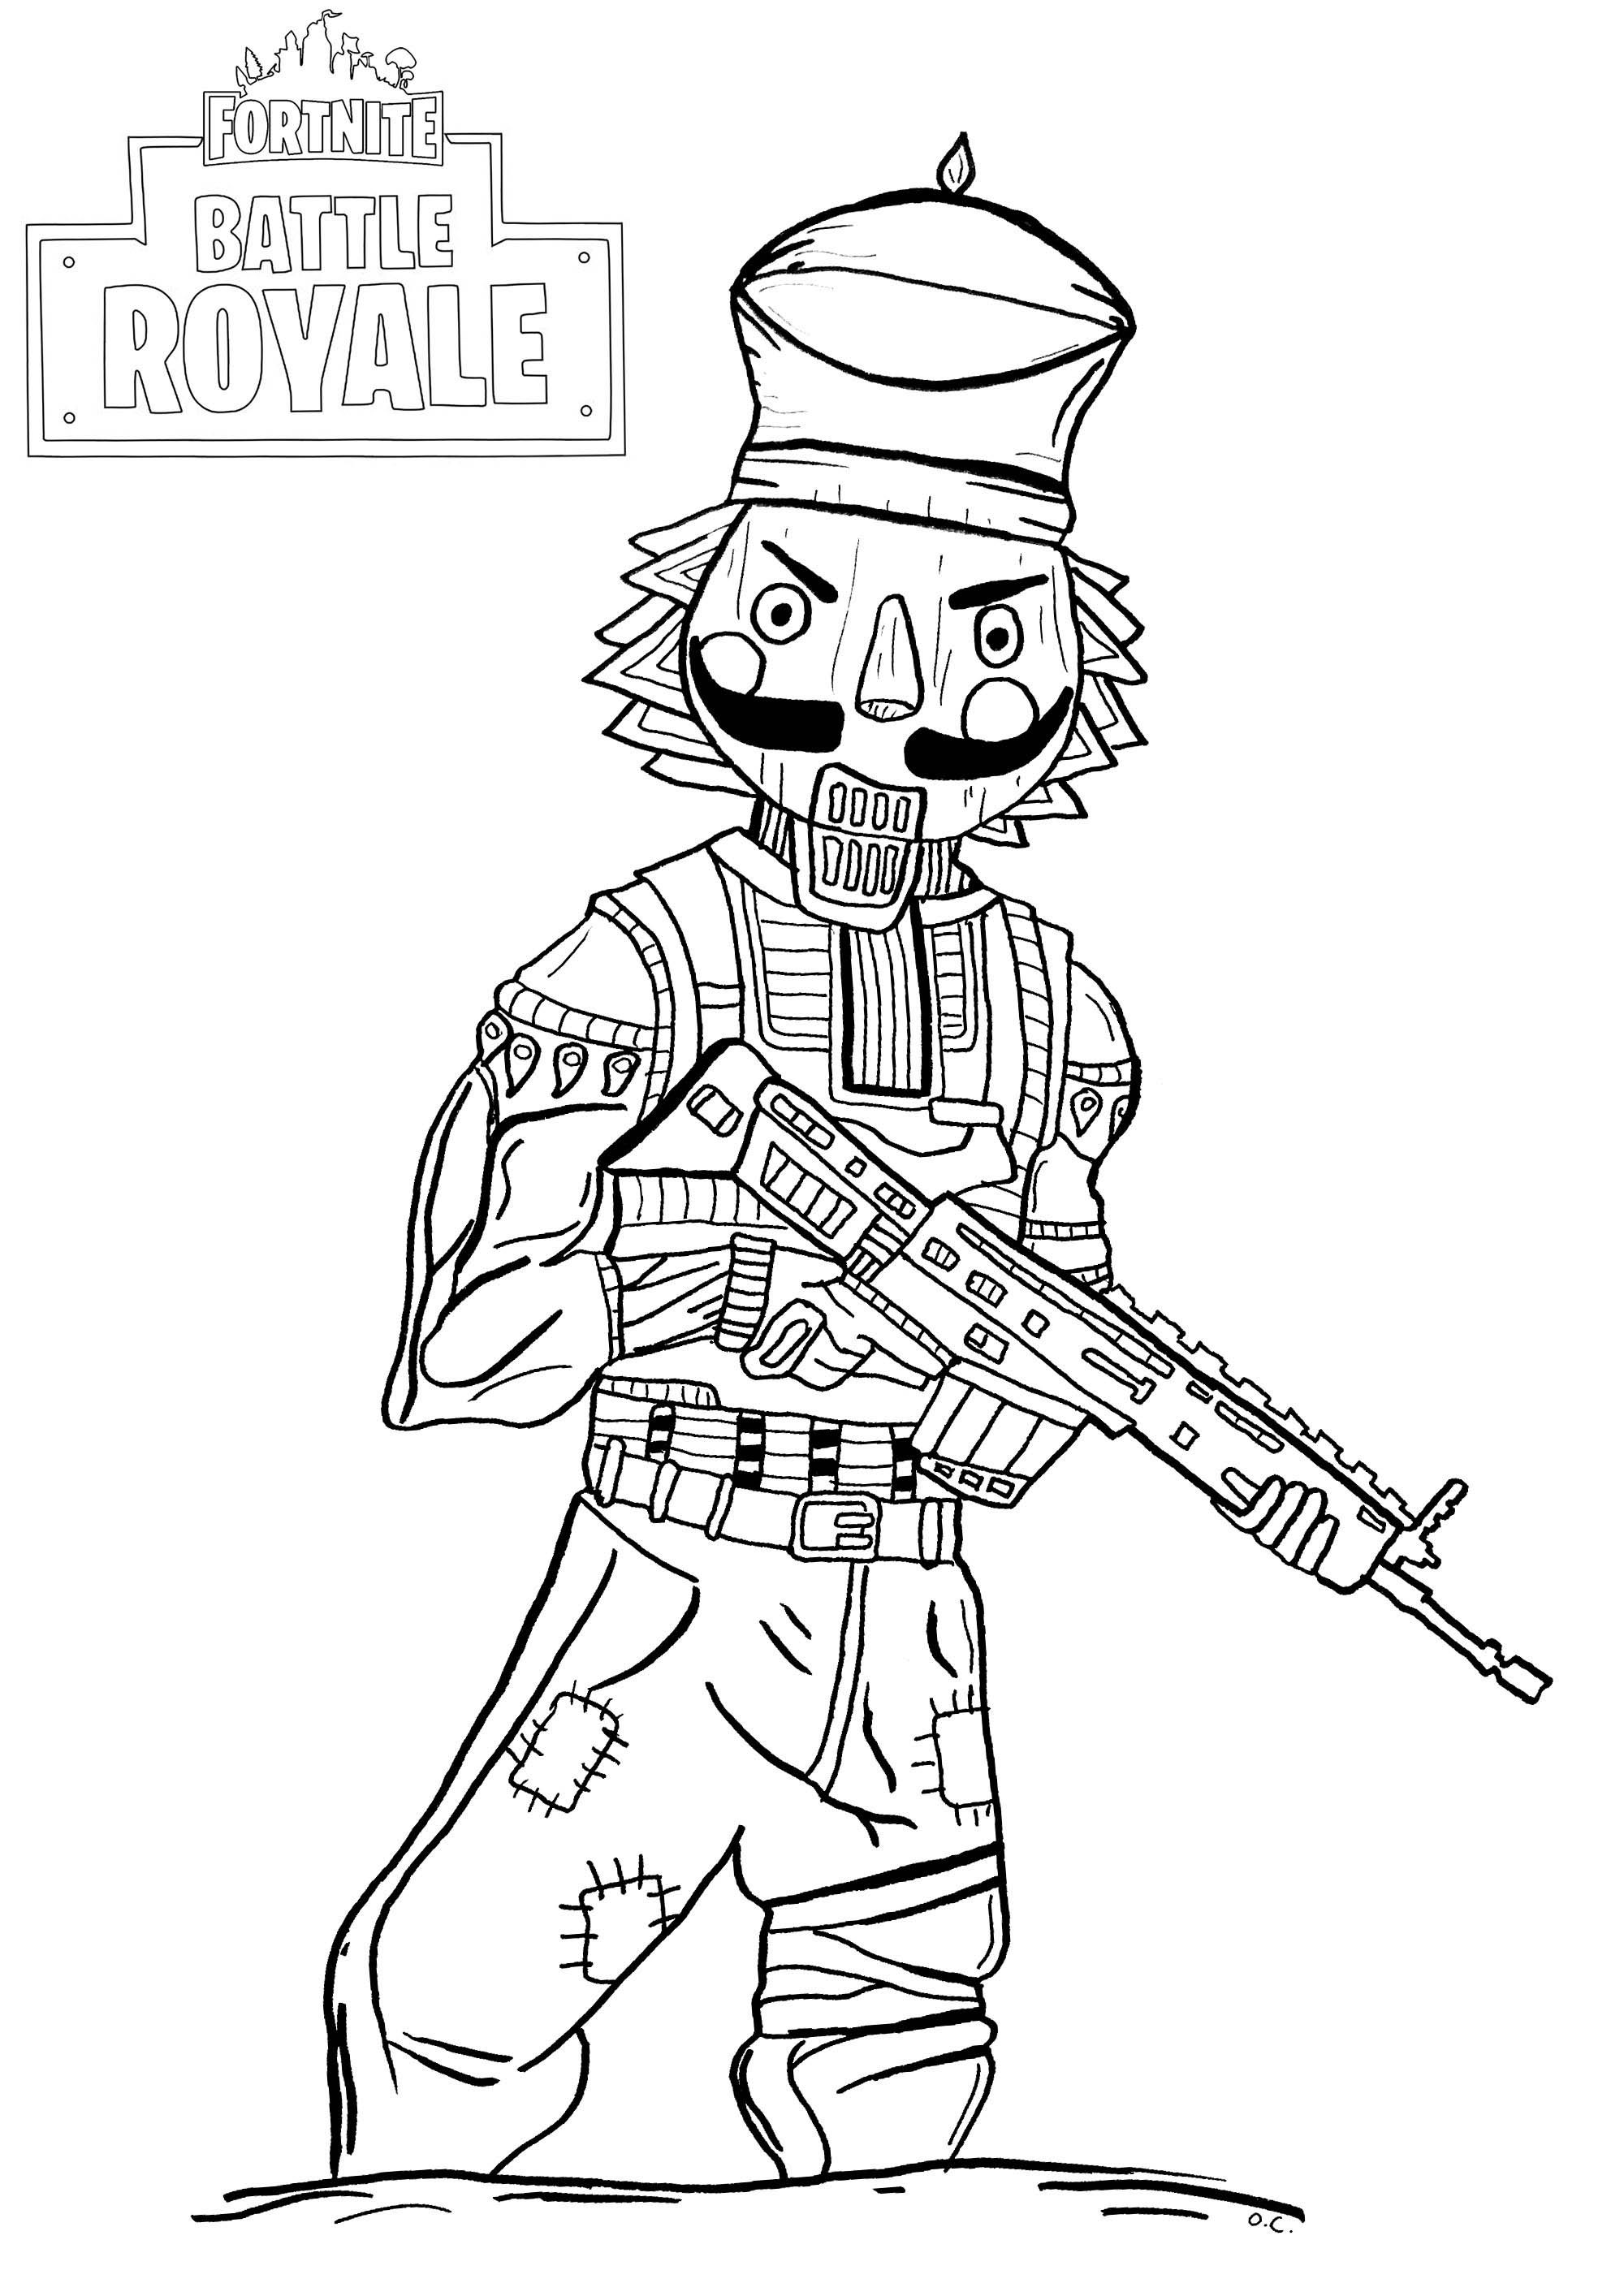 Crackshot Equipo Legendario Disponible En Fortnite Battle Royale